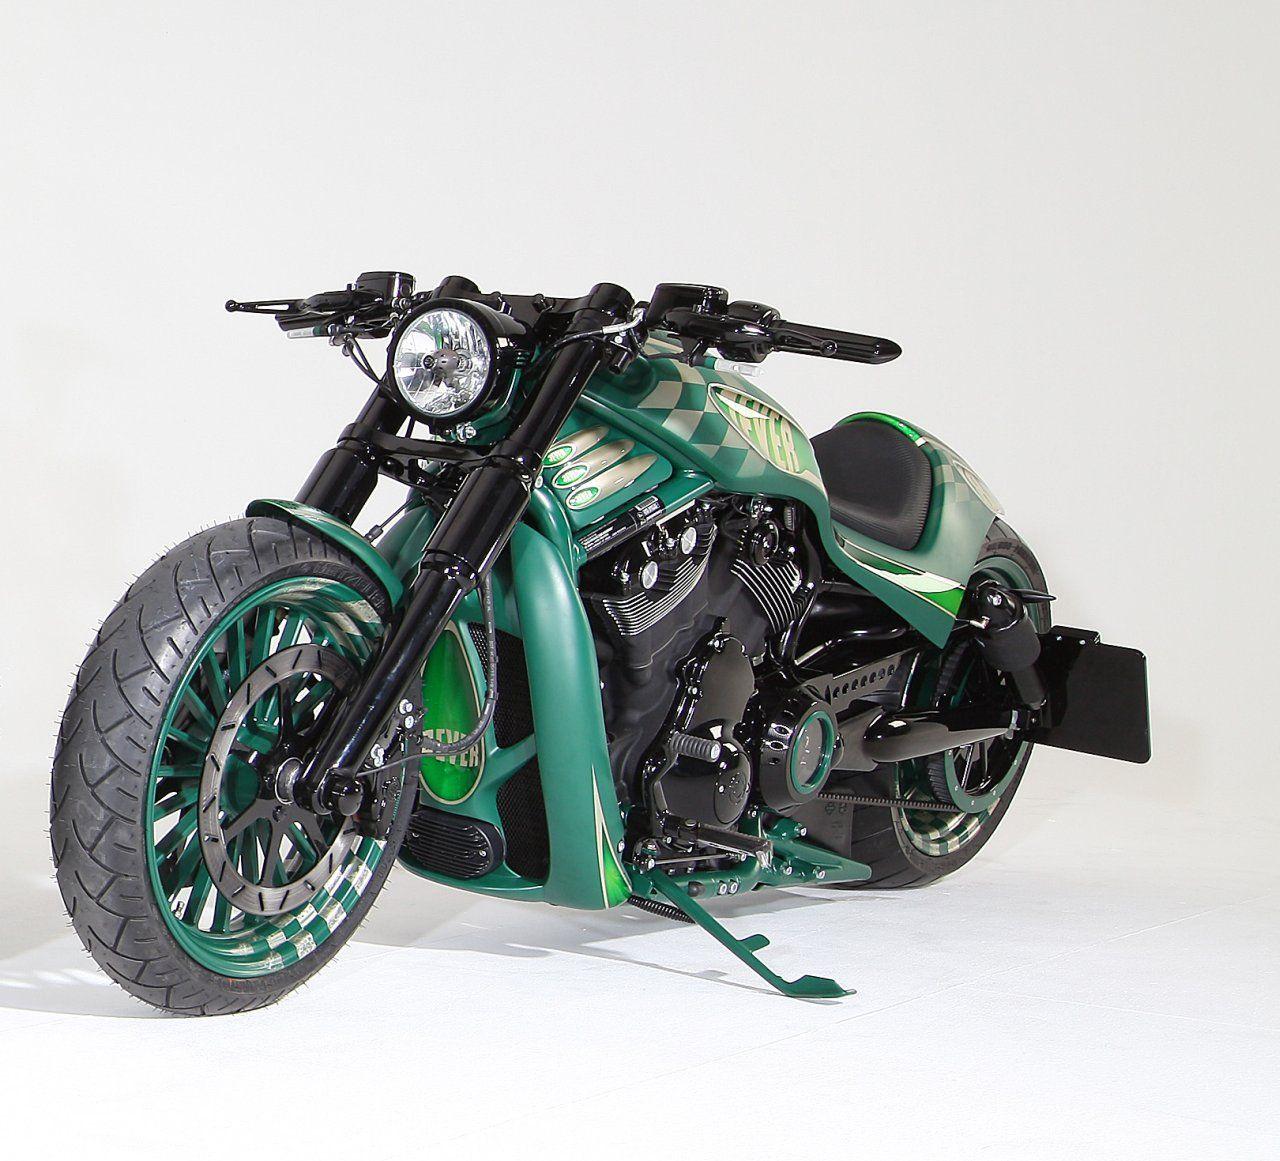 Harley Davidson Green Models My Bikes & Cars Pinterest